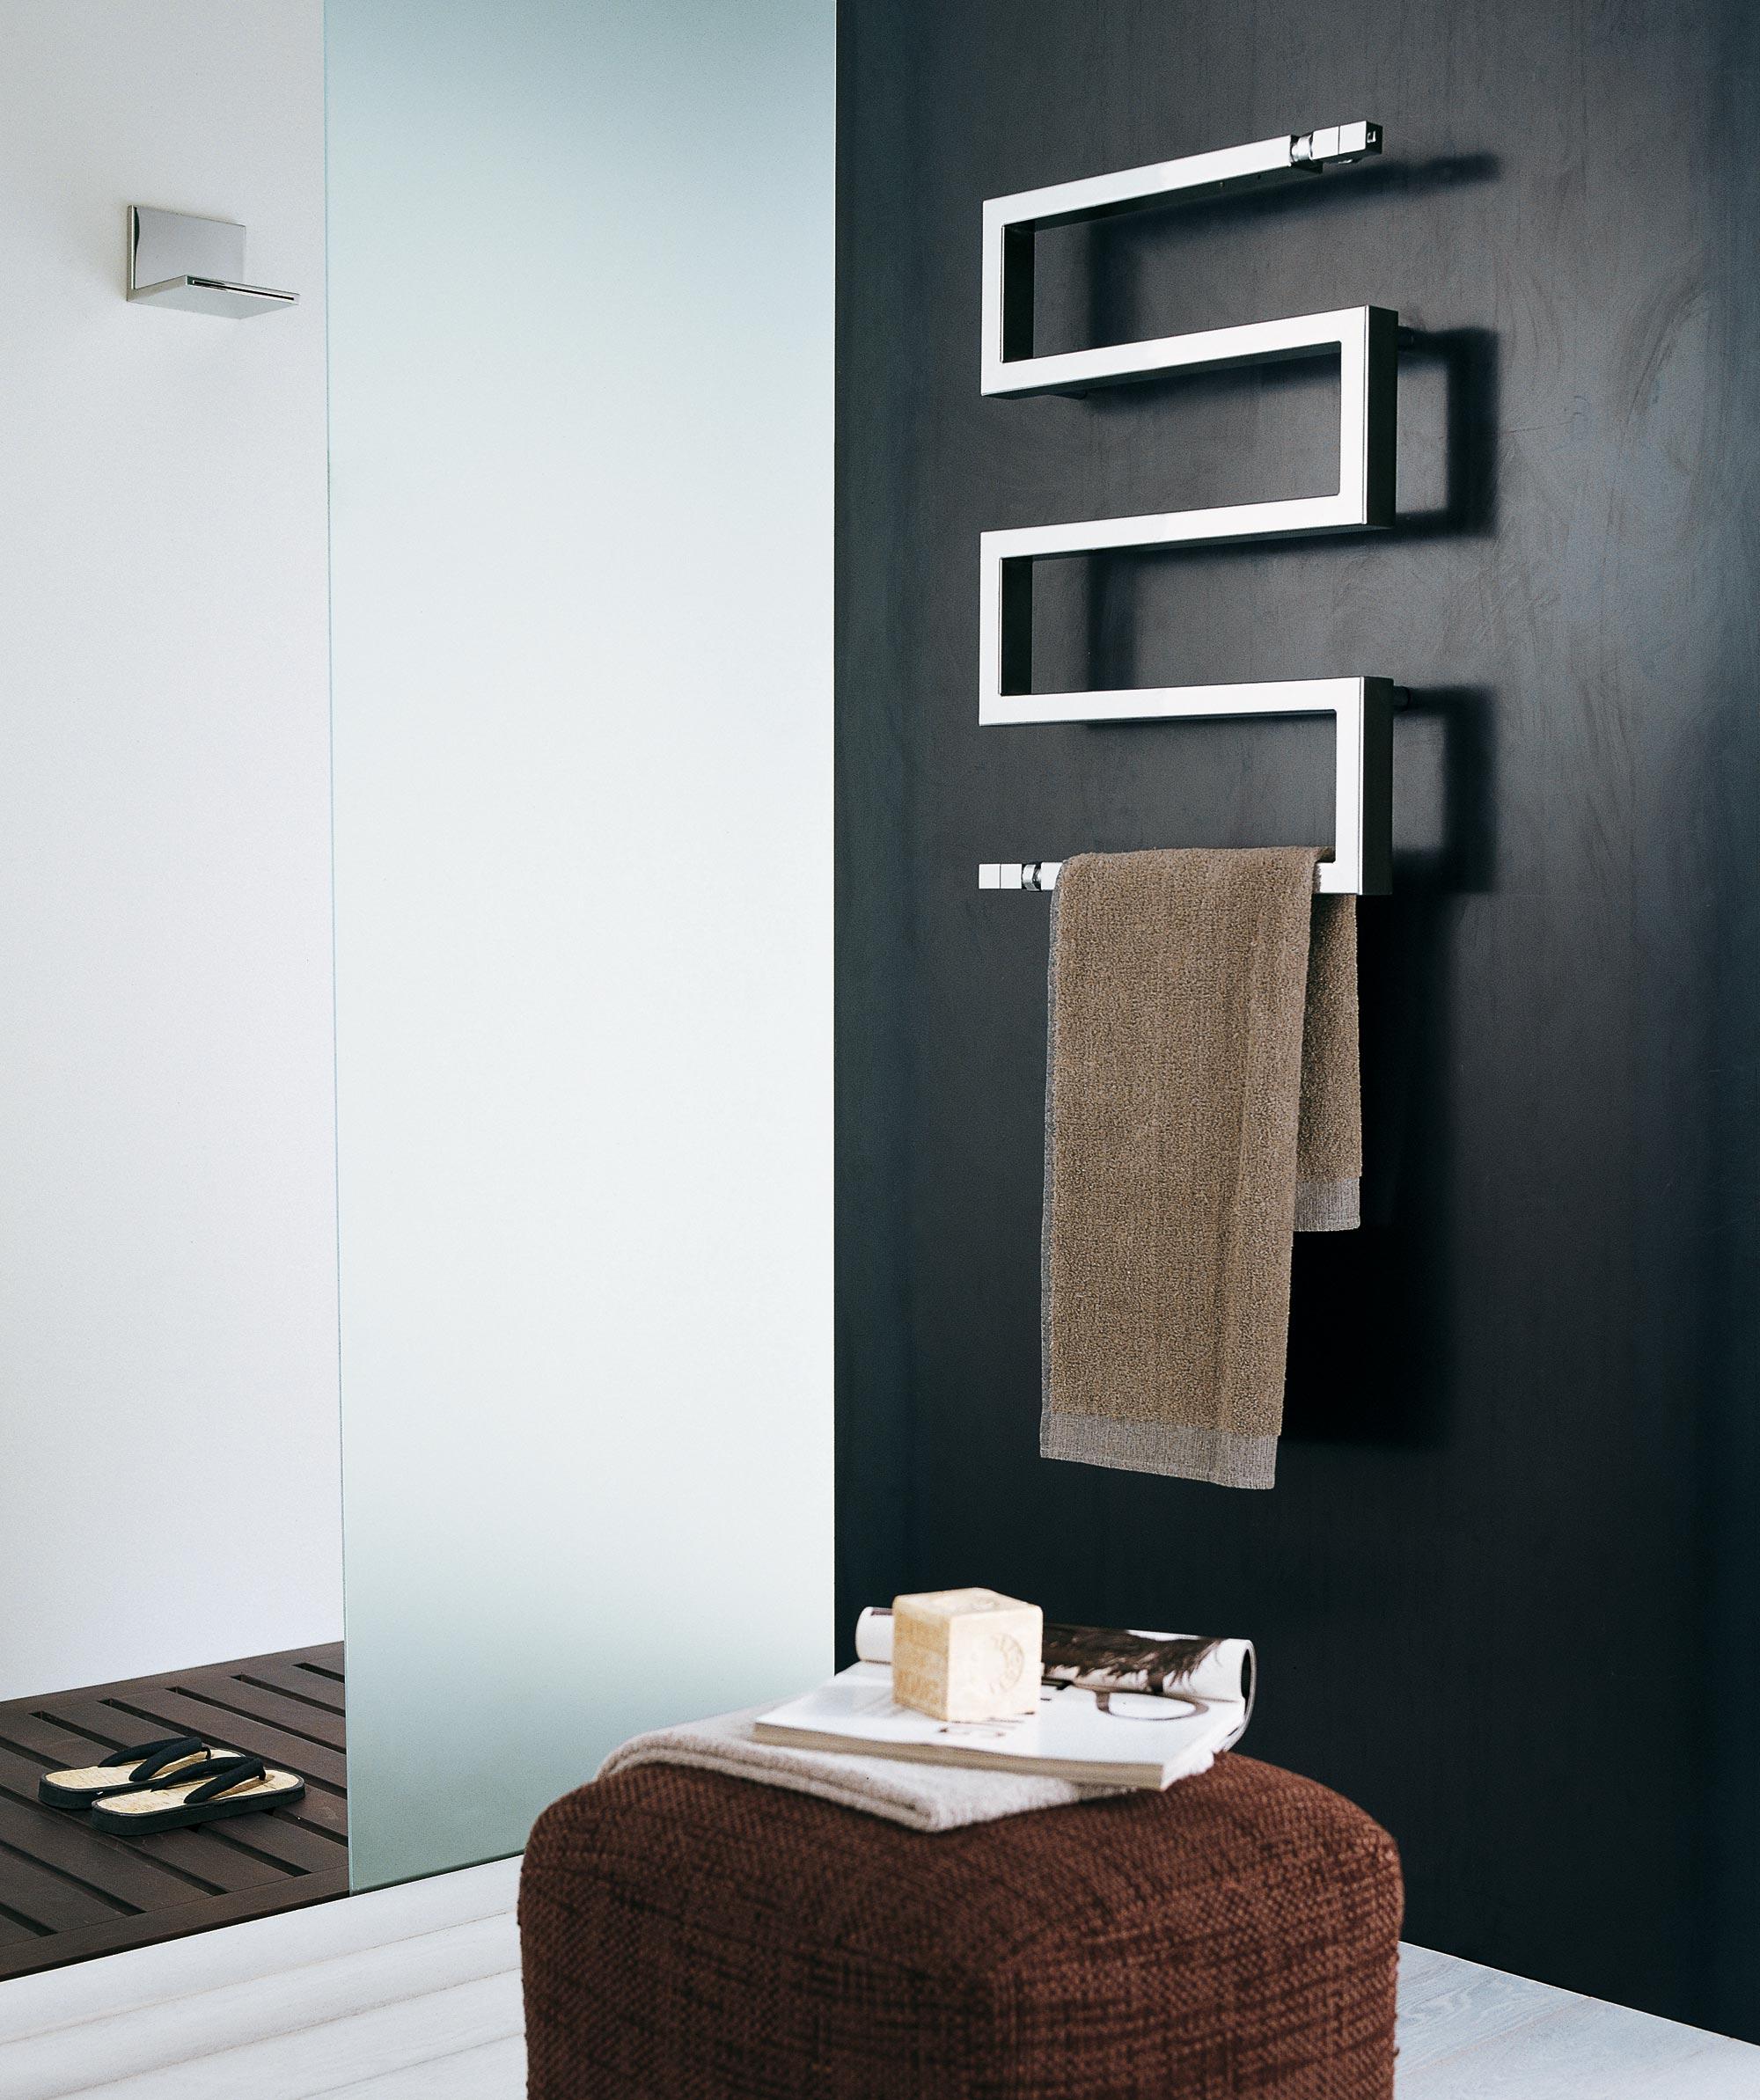 badheizkörper und handtuchtrockner: design endet nie